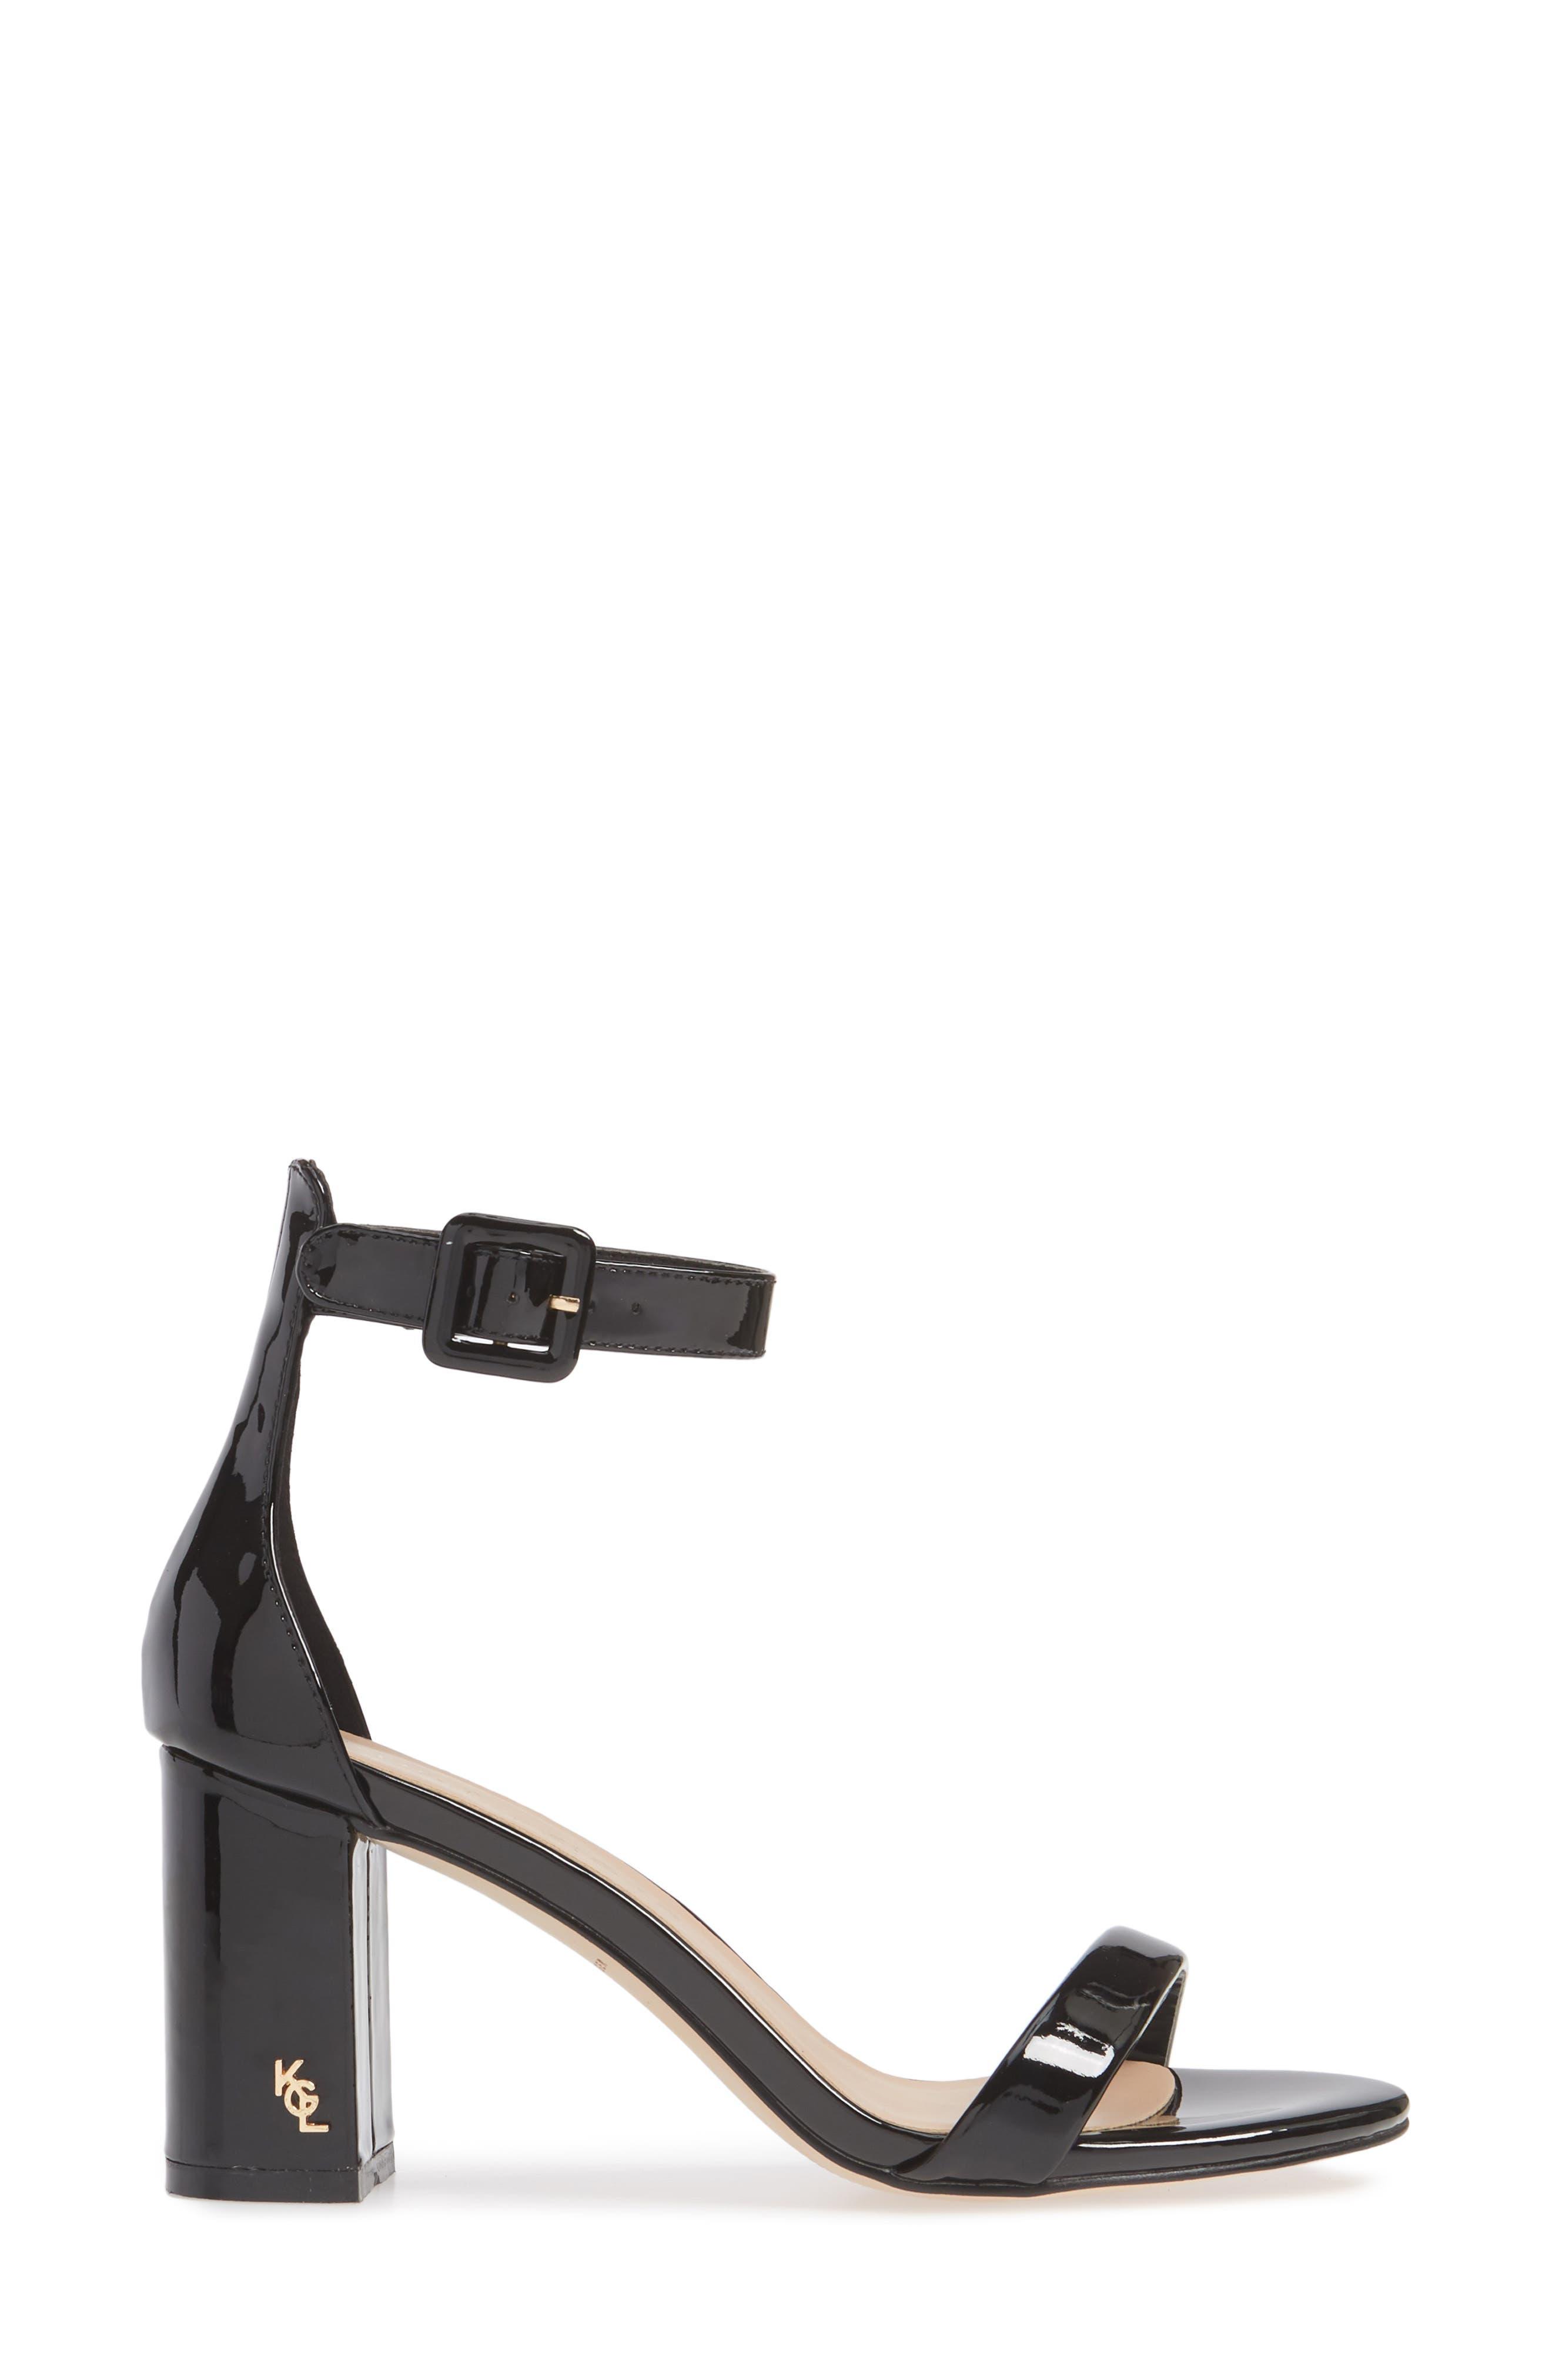 Langley Ankle Strap Sandal,                             Alternate thumbnail 3, color,                             BLACK LEATHER